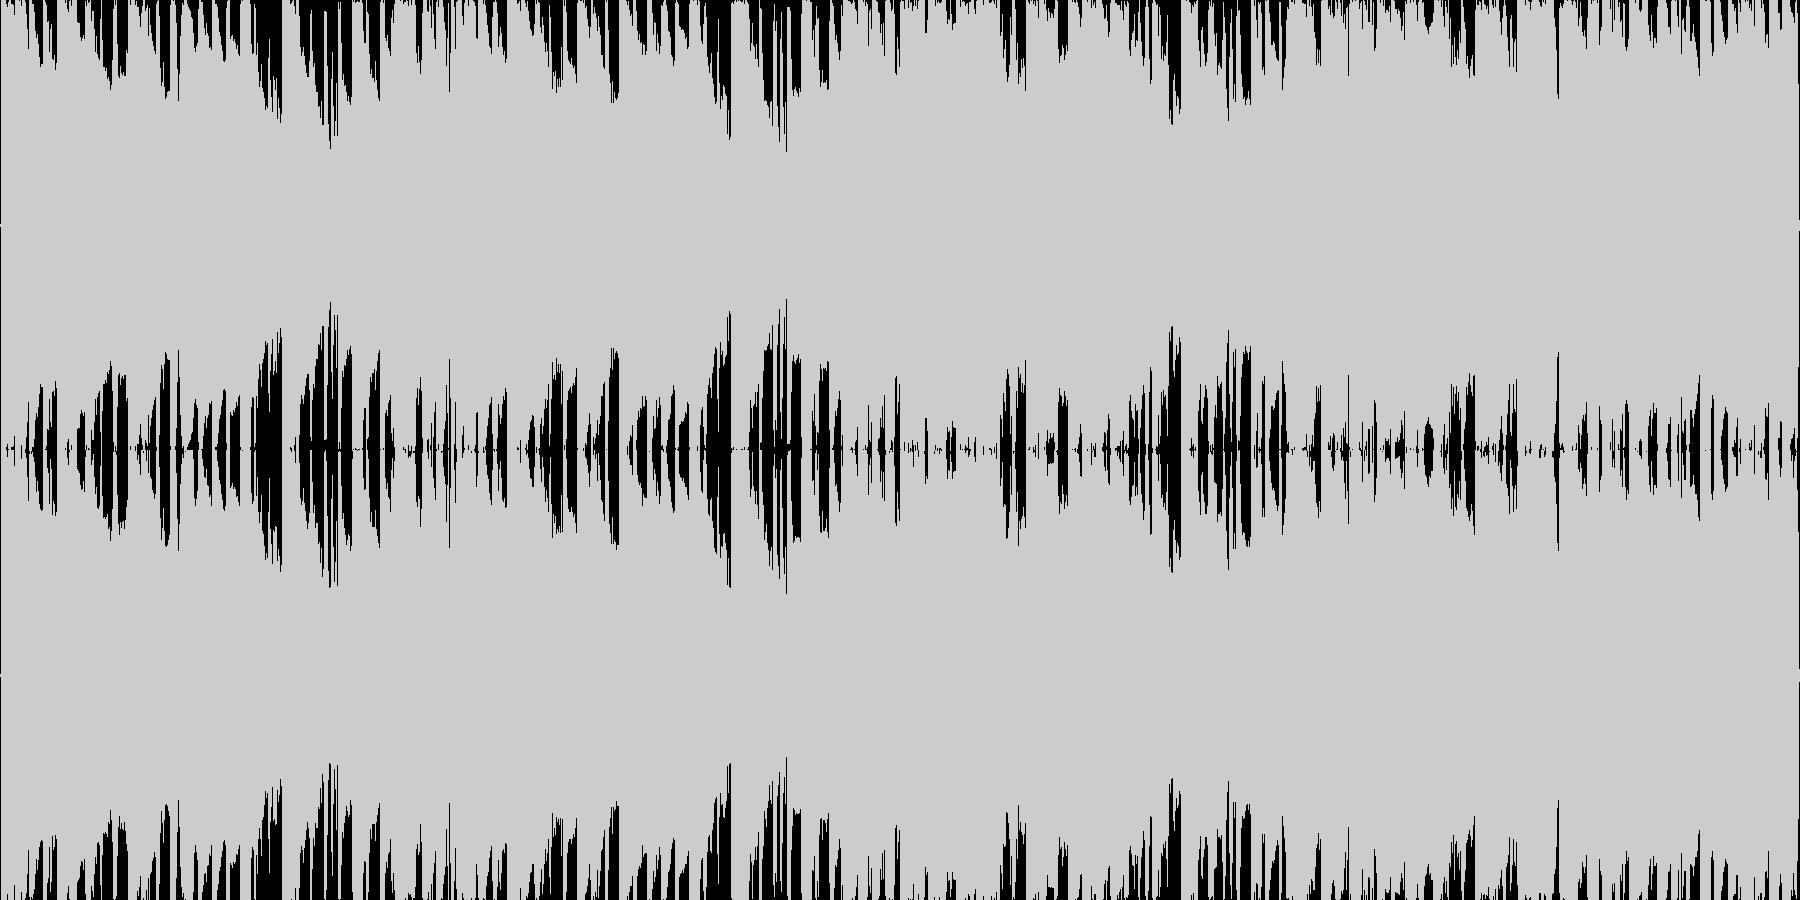 8bitチューンのRPG風フィールド用4の未再生の波形